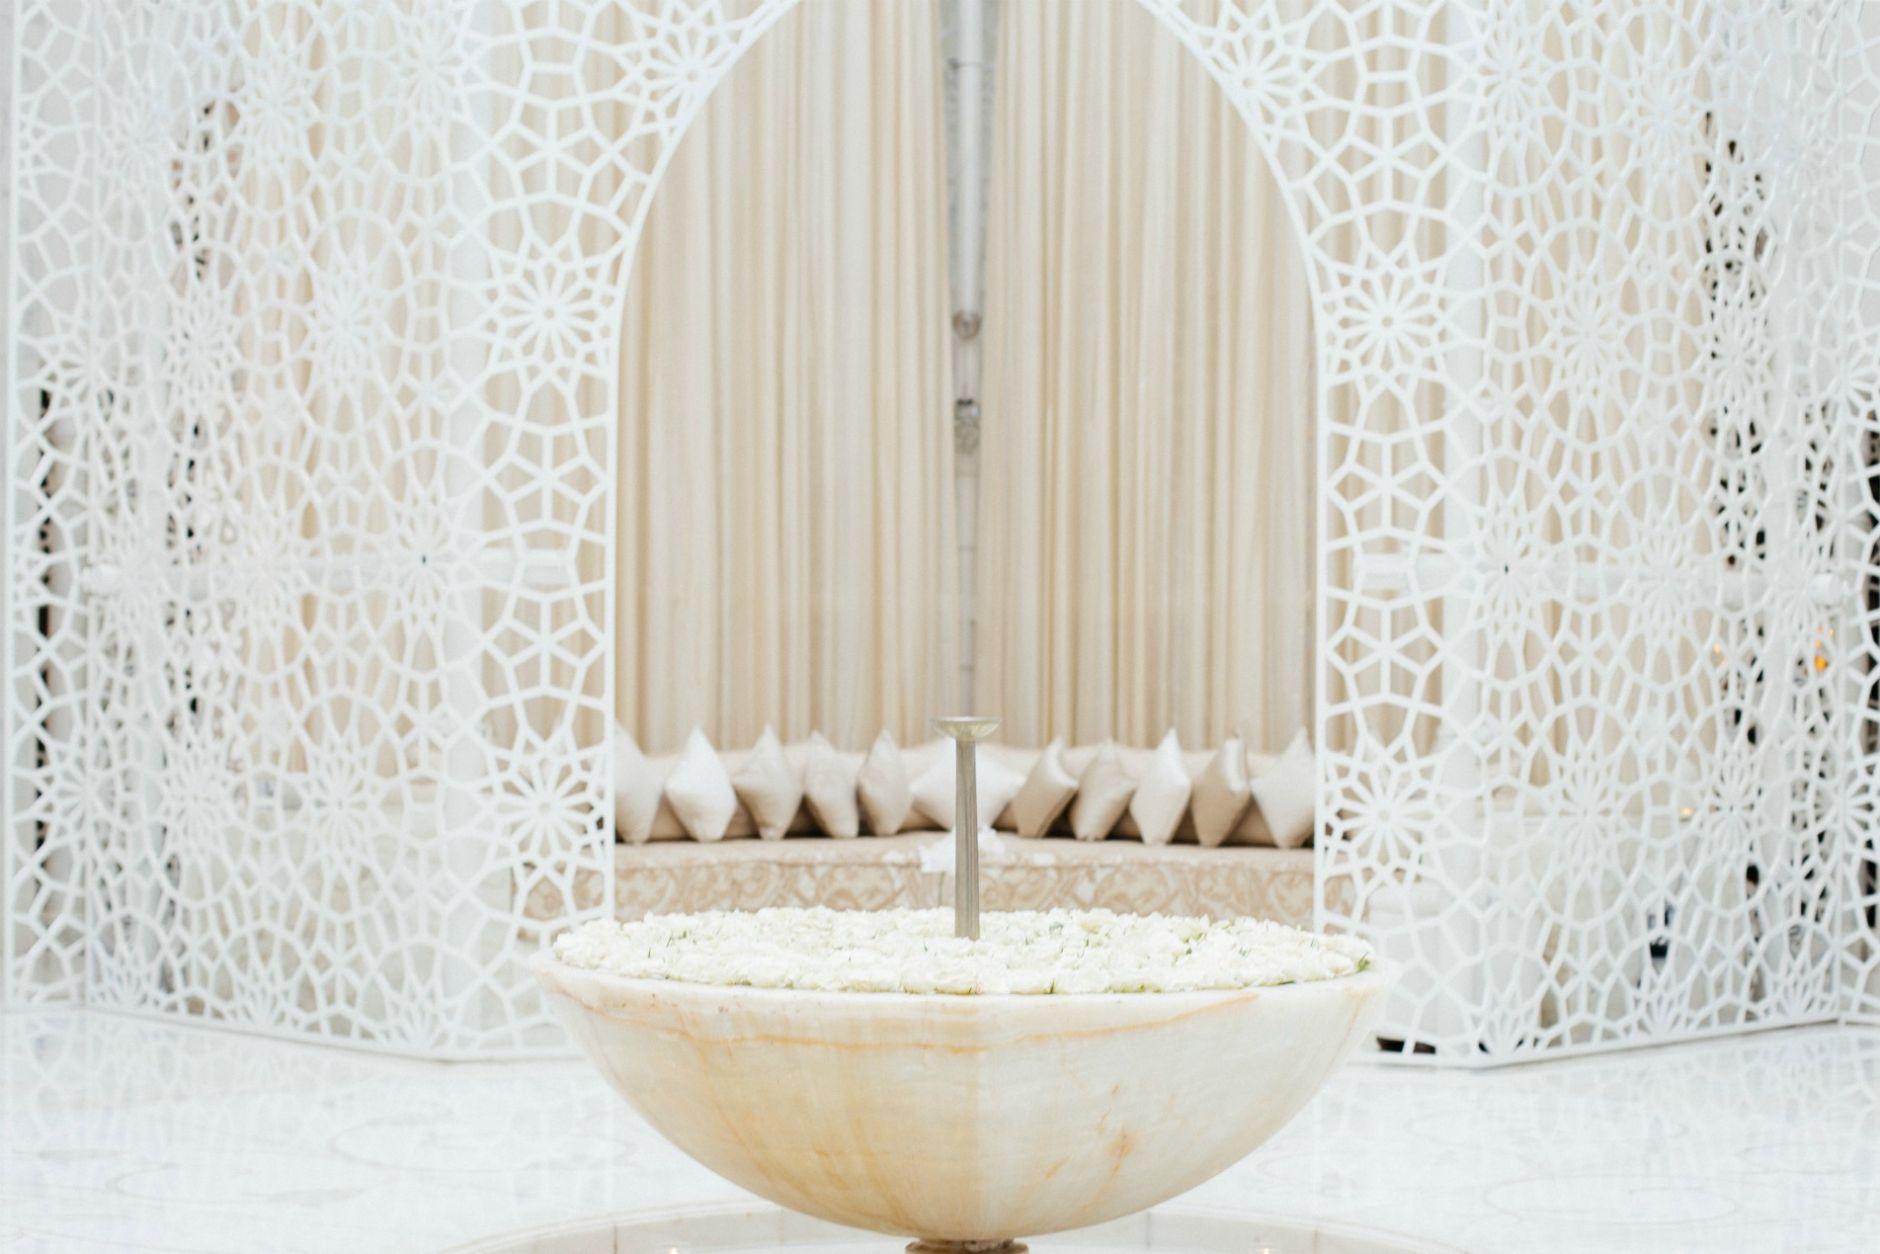 royal-mansour-hotel-luxury-marrakesch-marrakesh-morocco-edisa-shahini-disicouture-blog-029933sx